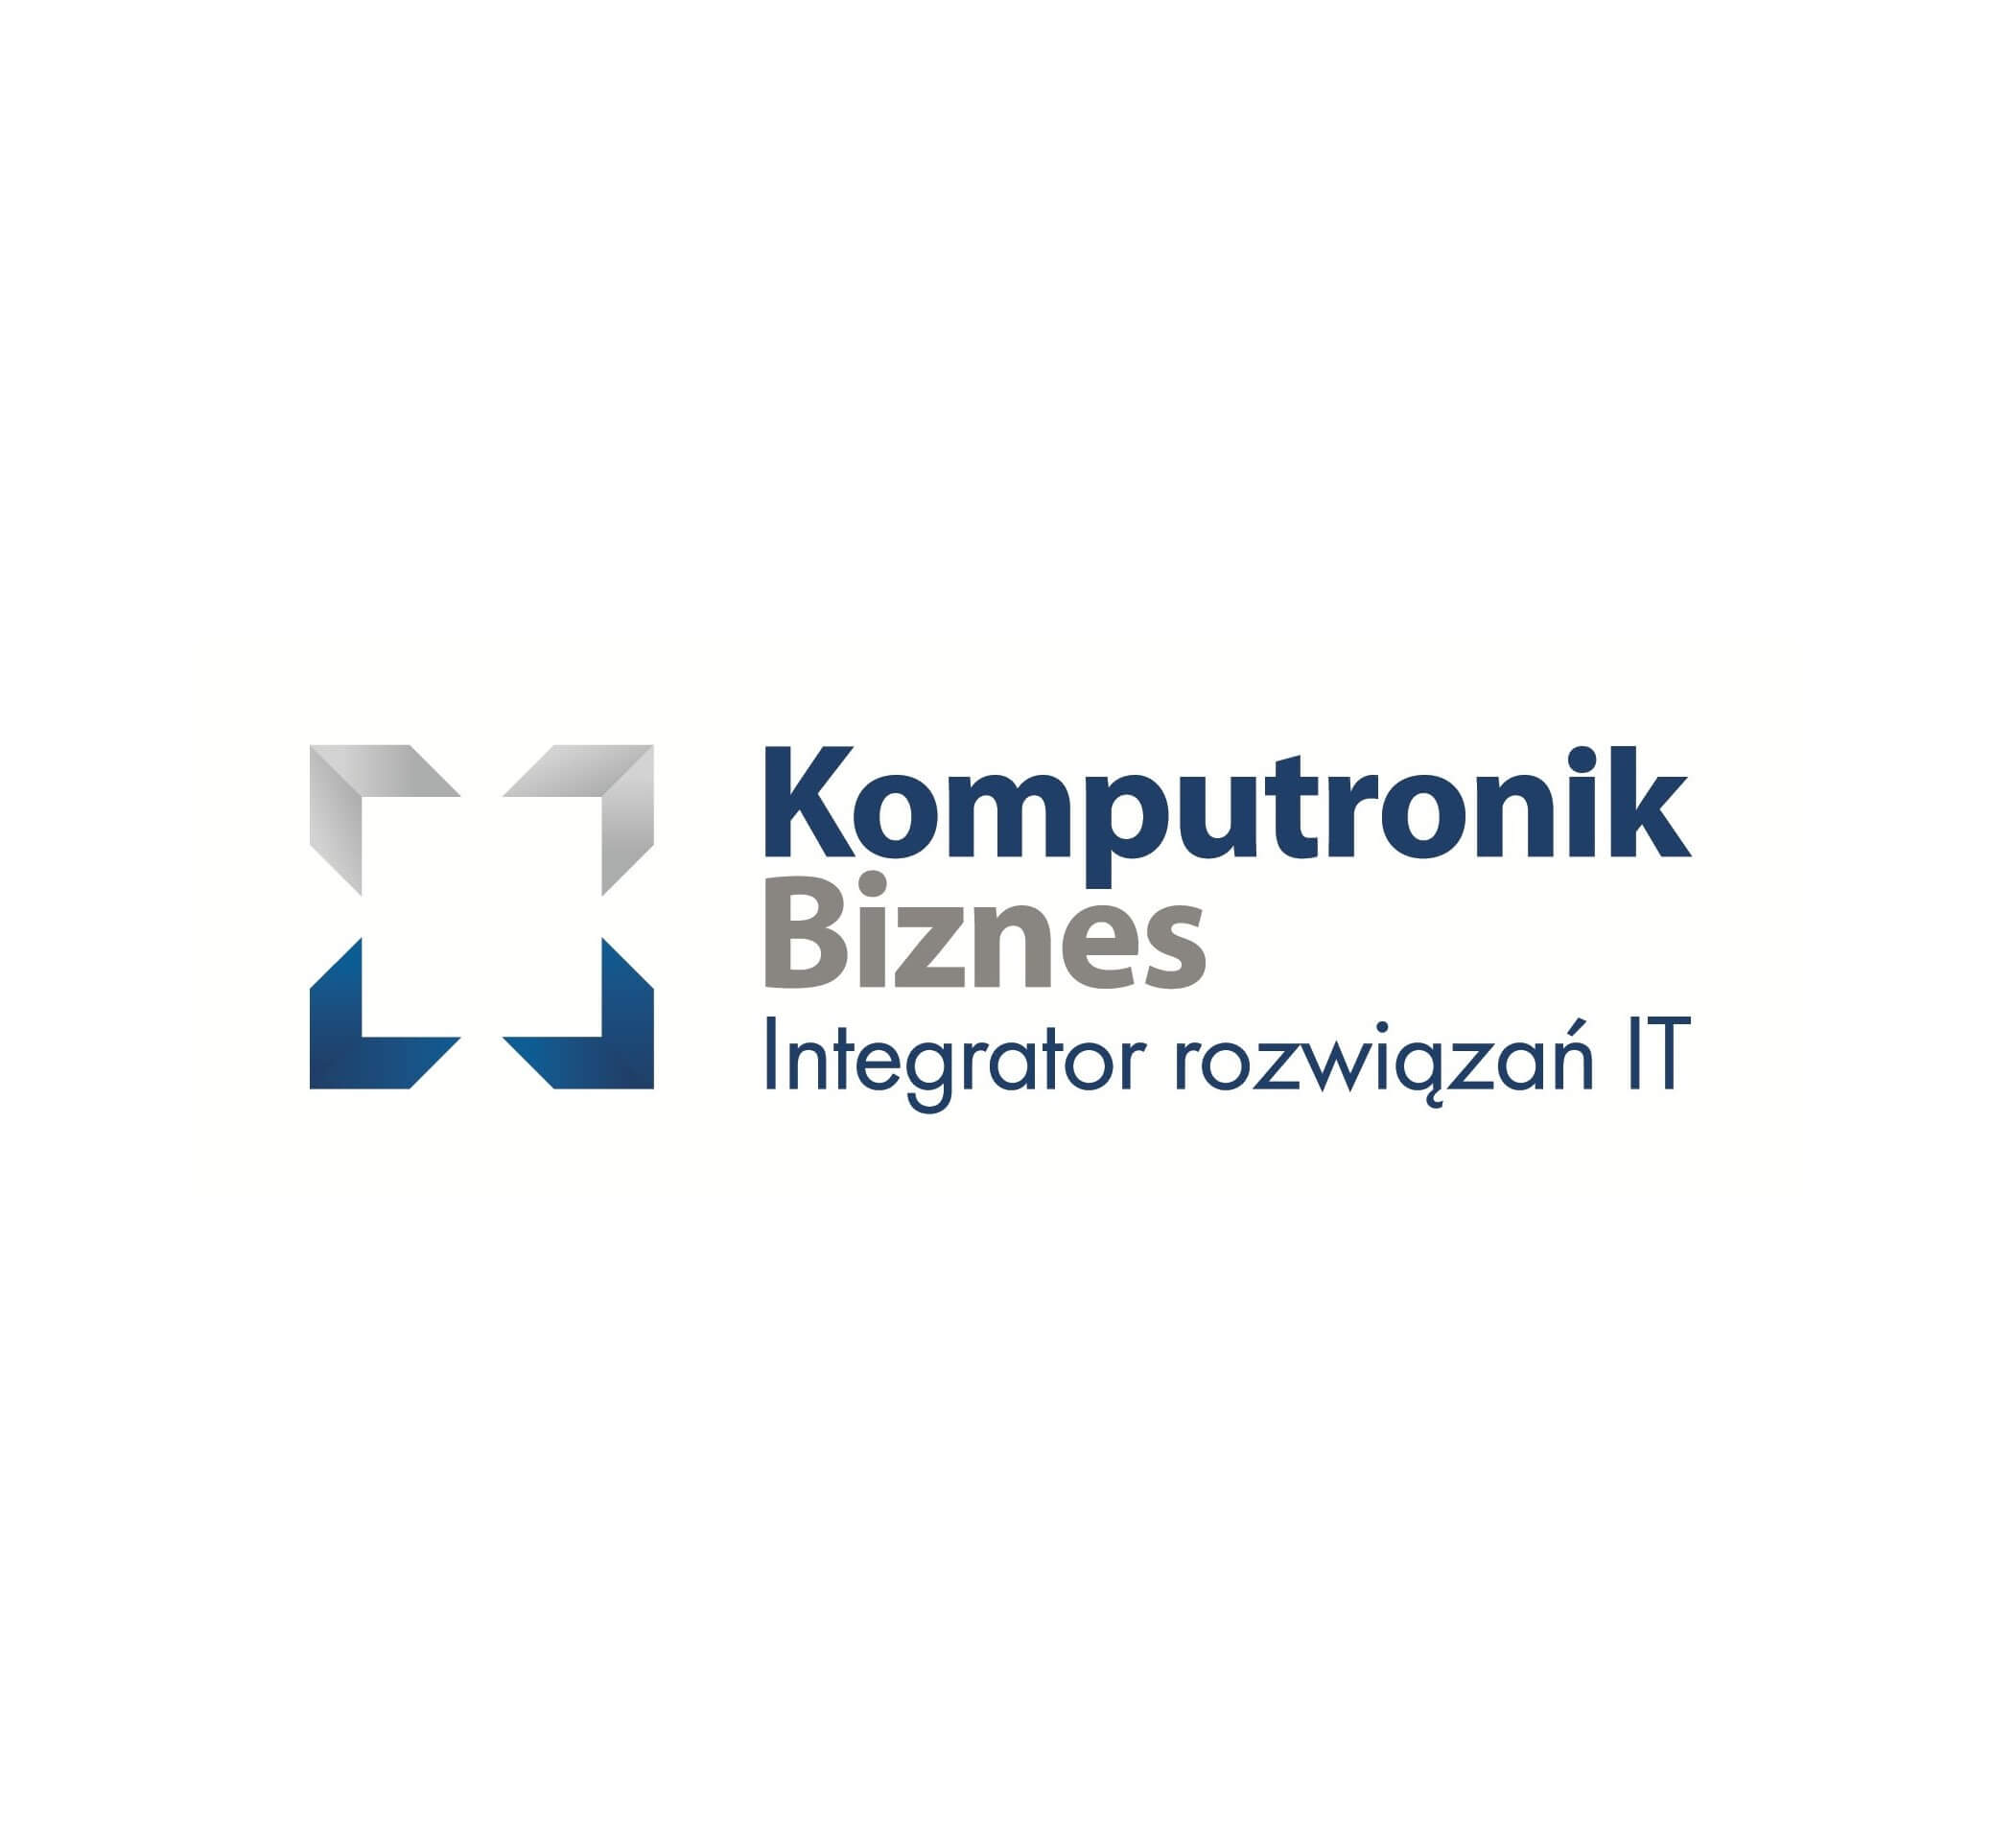 Komputronik Biznes